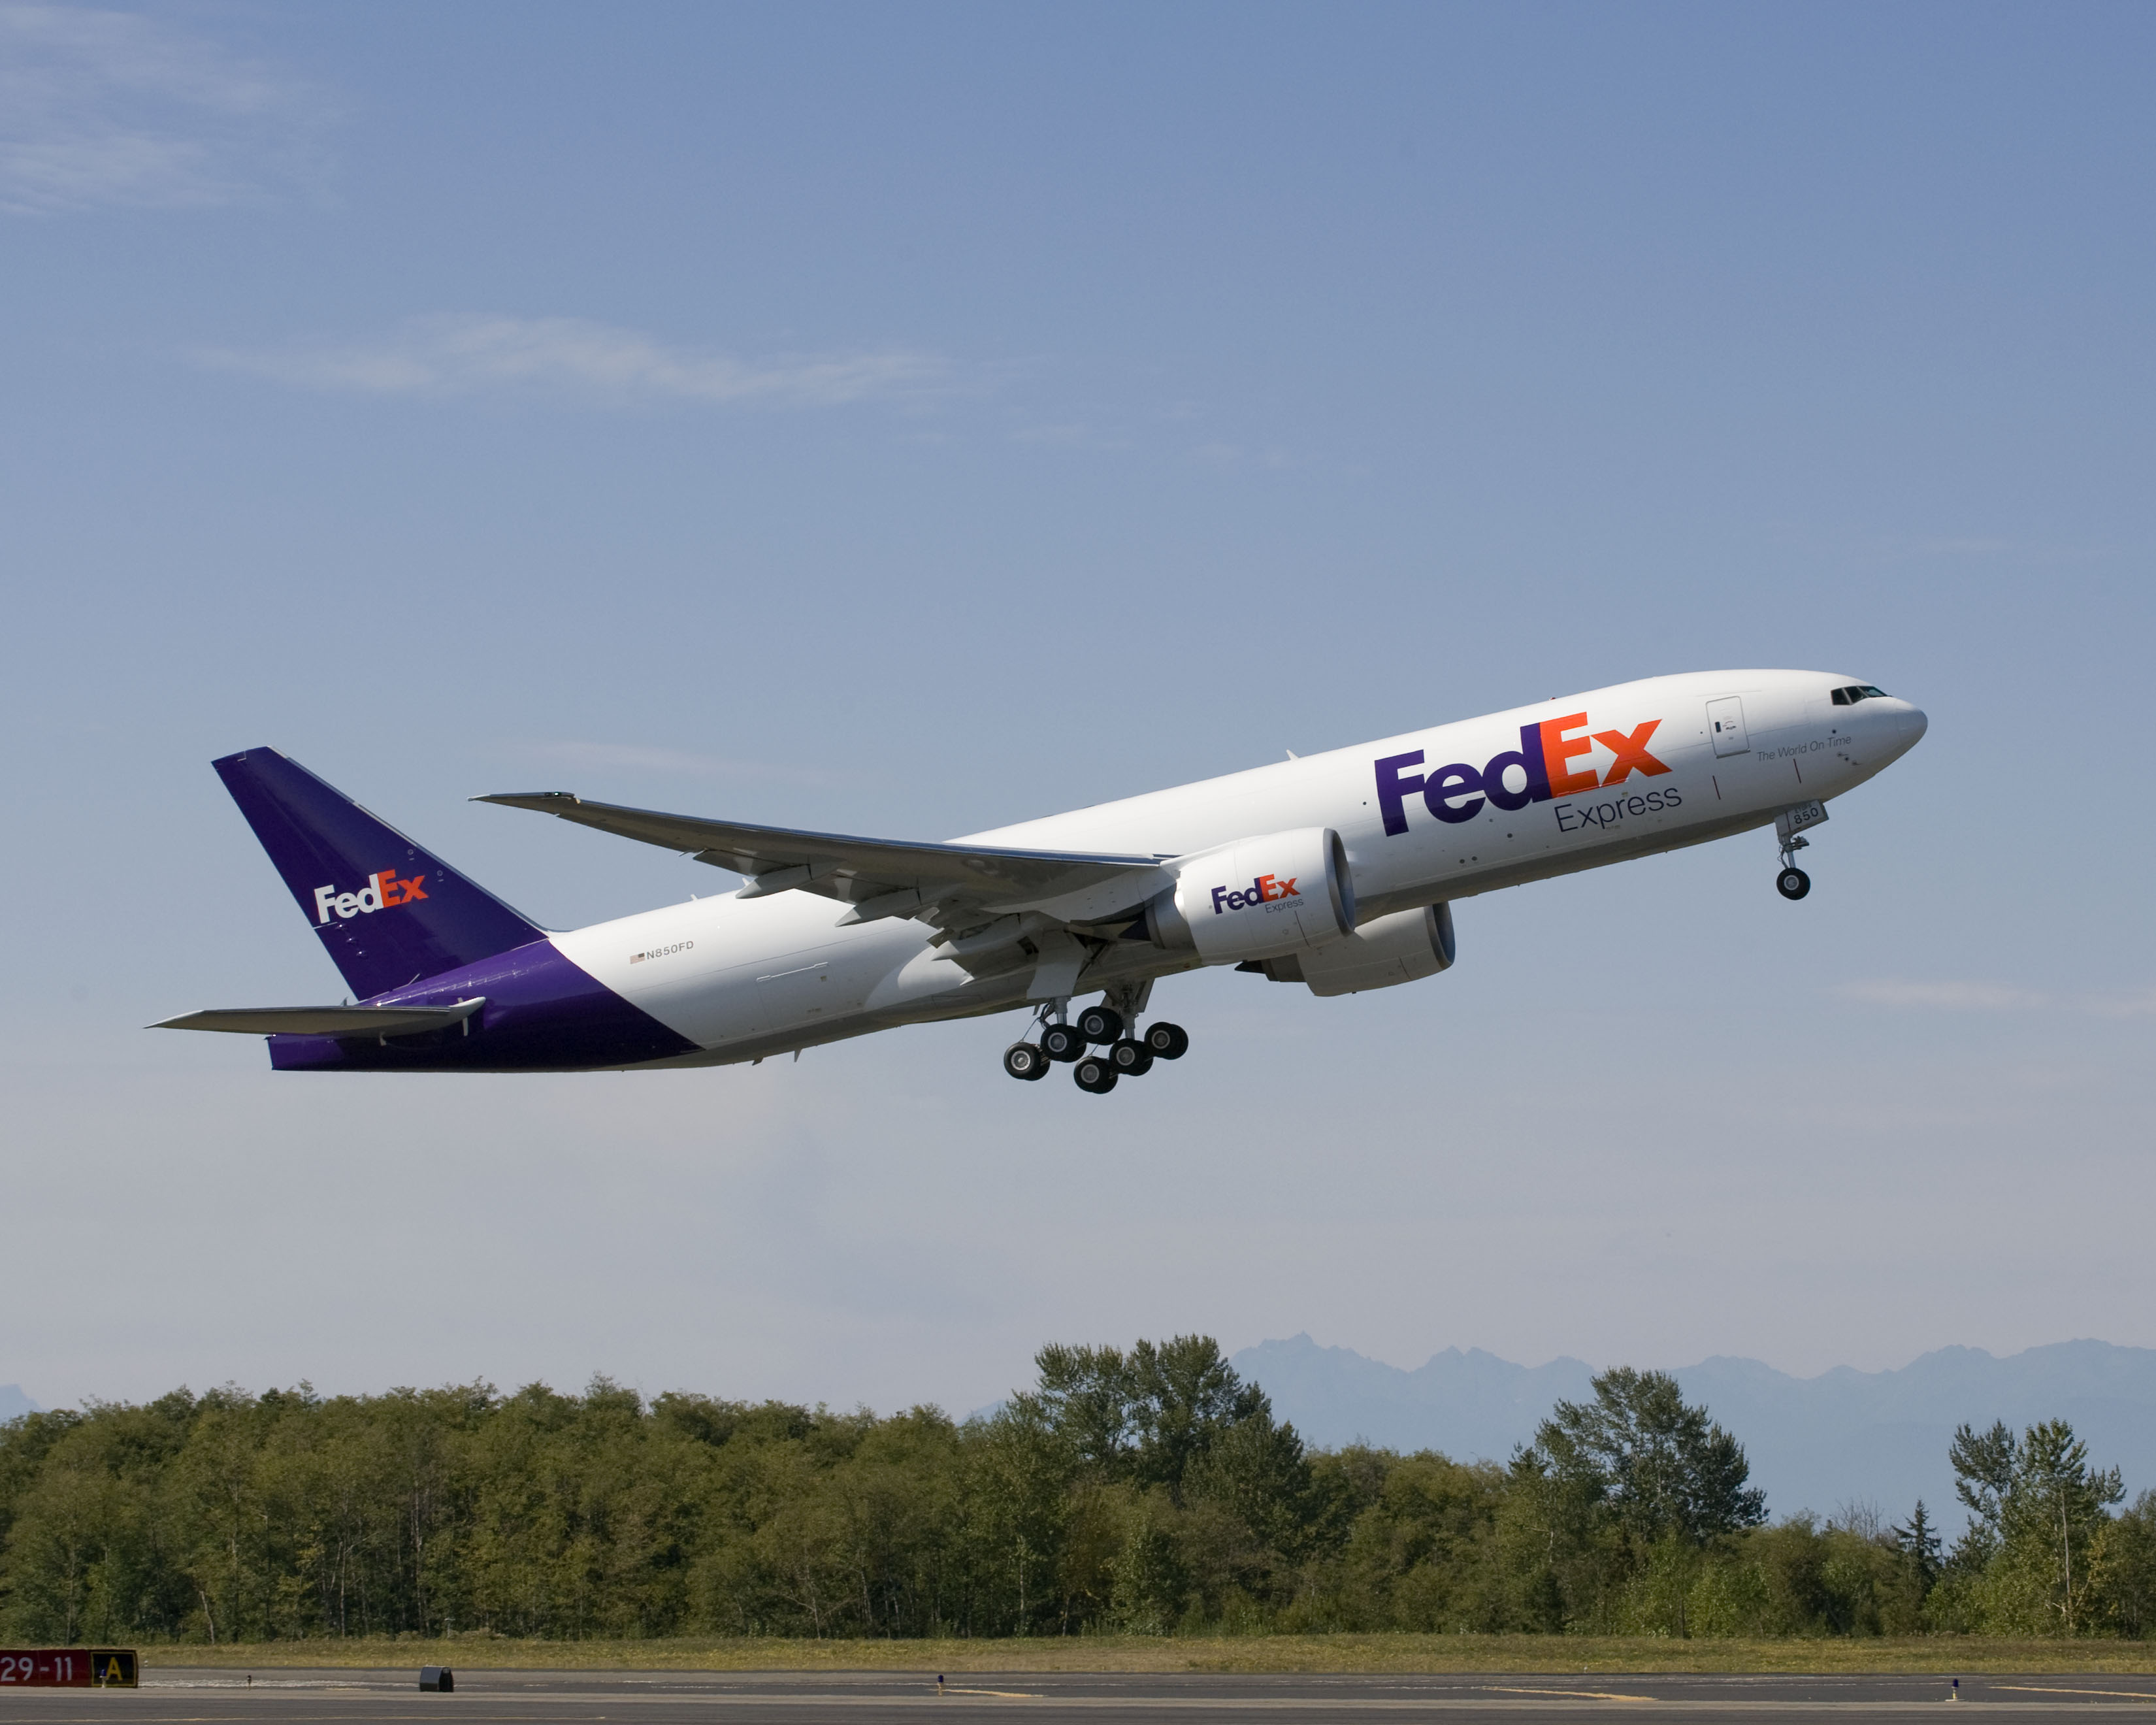 FedEx燃油附加费 UPS燃油附加费 TNT燃油附加费 FedEx国际快递 UPS国际快递 TNT国际快递 国际快递 燃油附加费 鹿跃国际快递